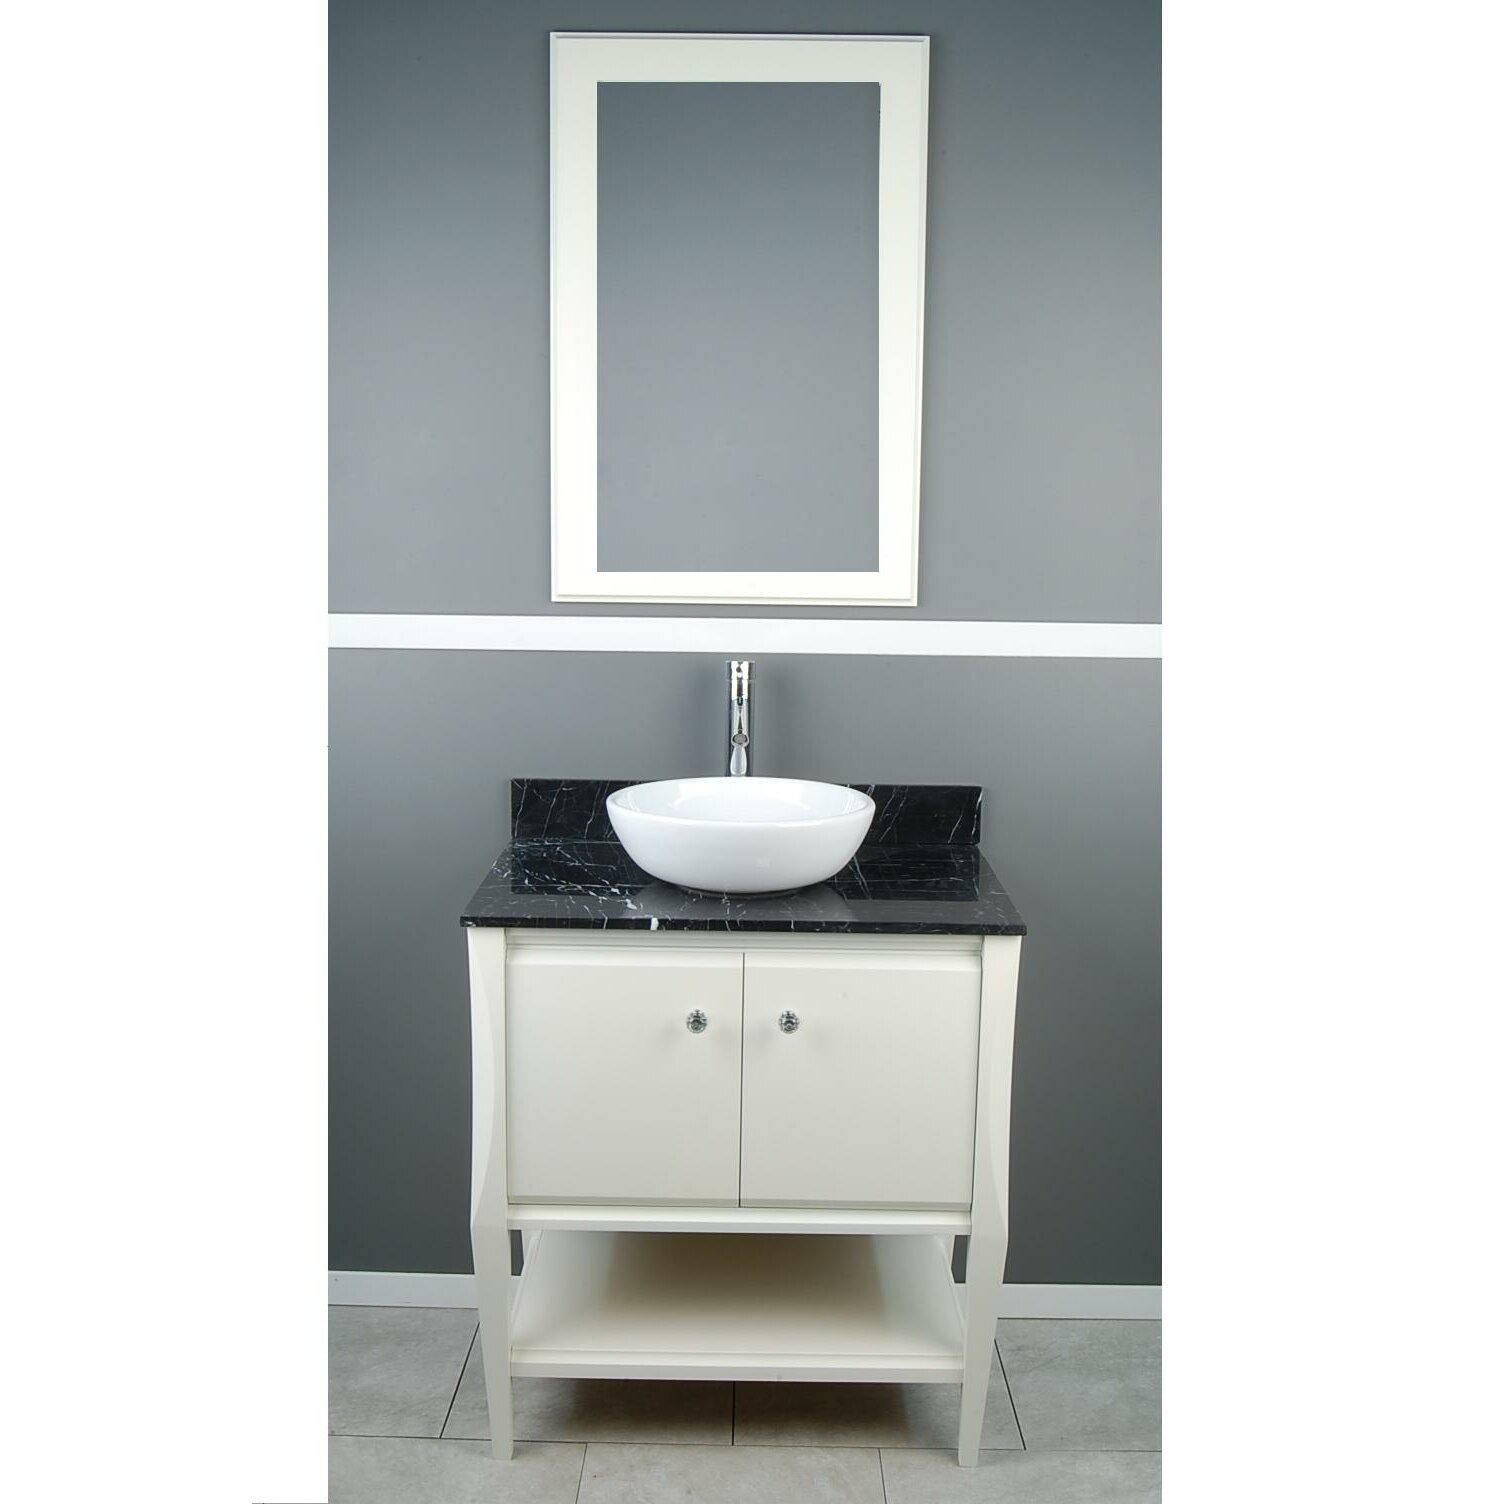 D 39 vontz sahara 31 single vanity set wayfair for Dvontz bathroom vanity